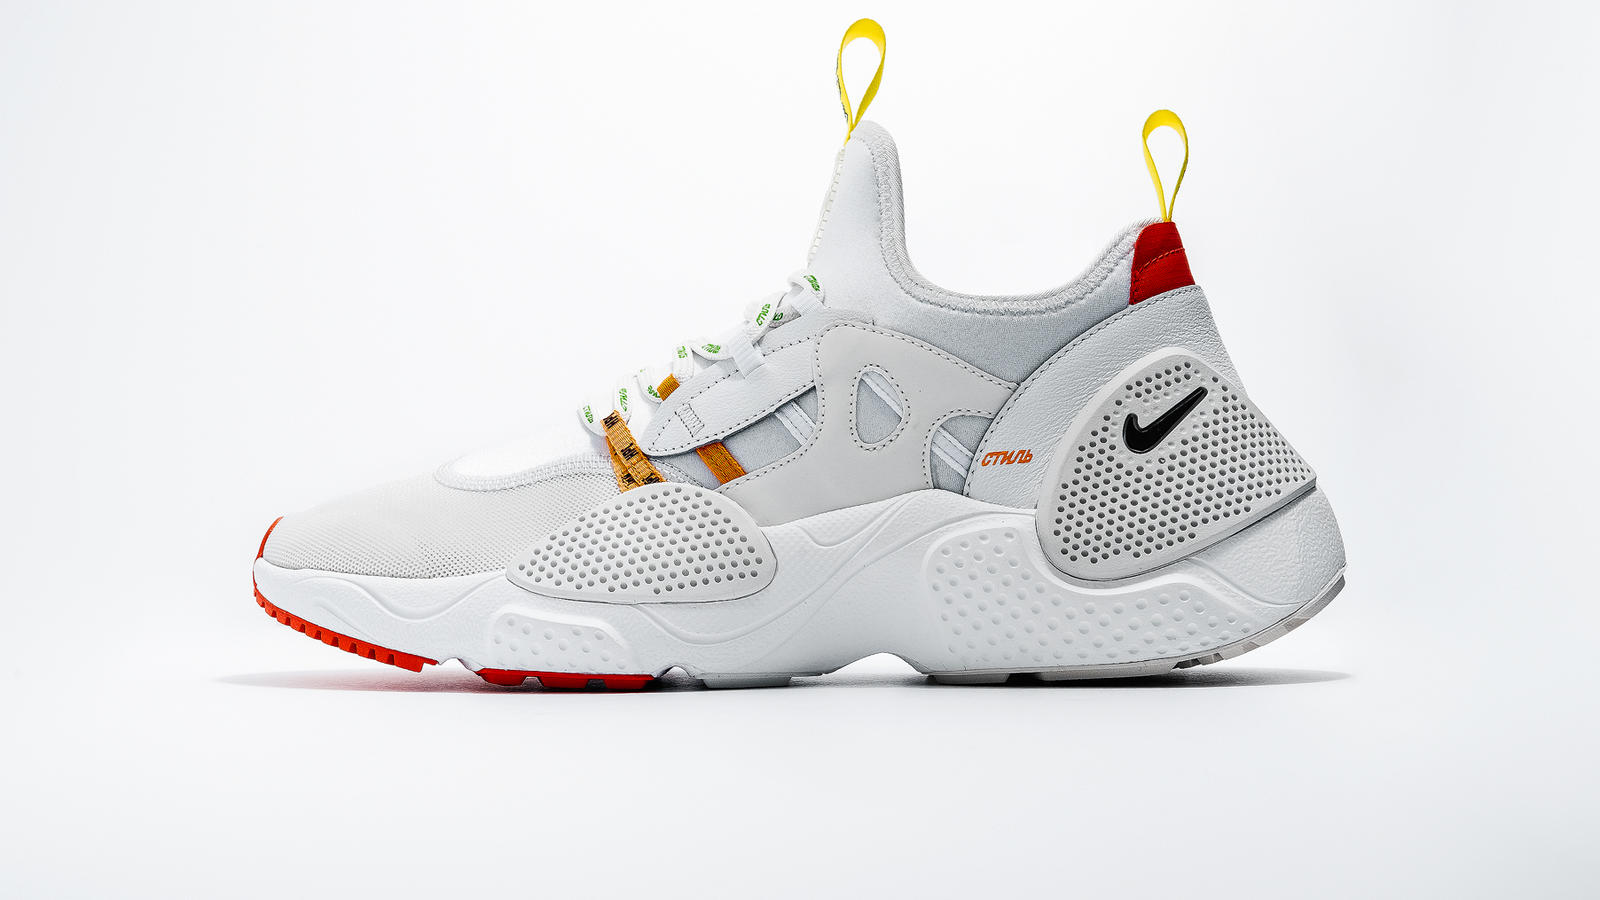 Nike x Heron Preston Huarache E.D.G.E. 1